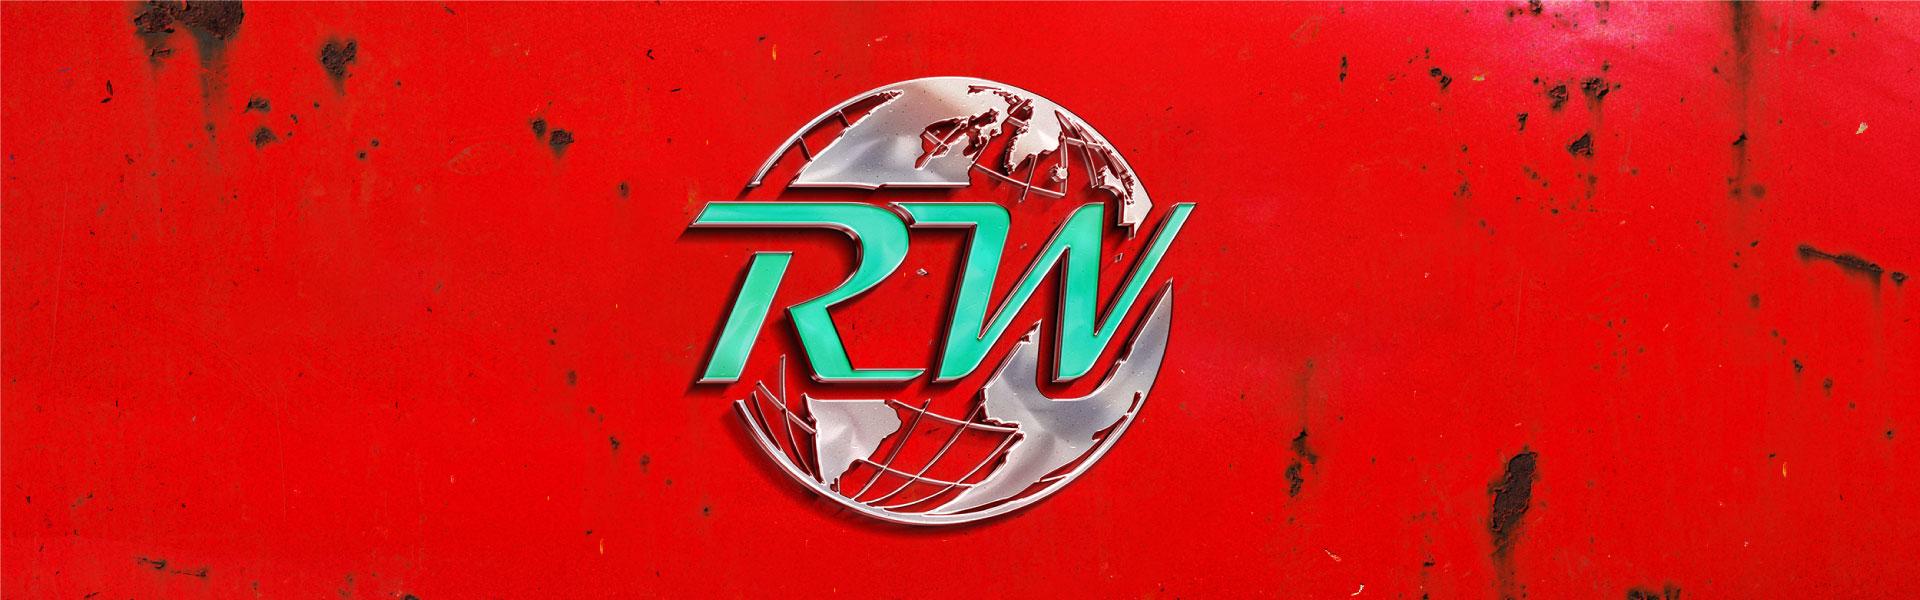 rust-world-brand-logo-design-by-mapleweb-vancouver-canada-header-image